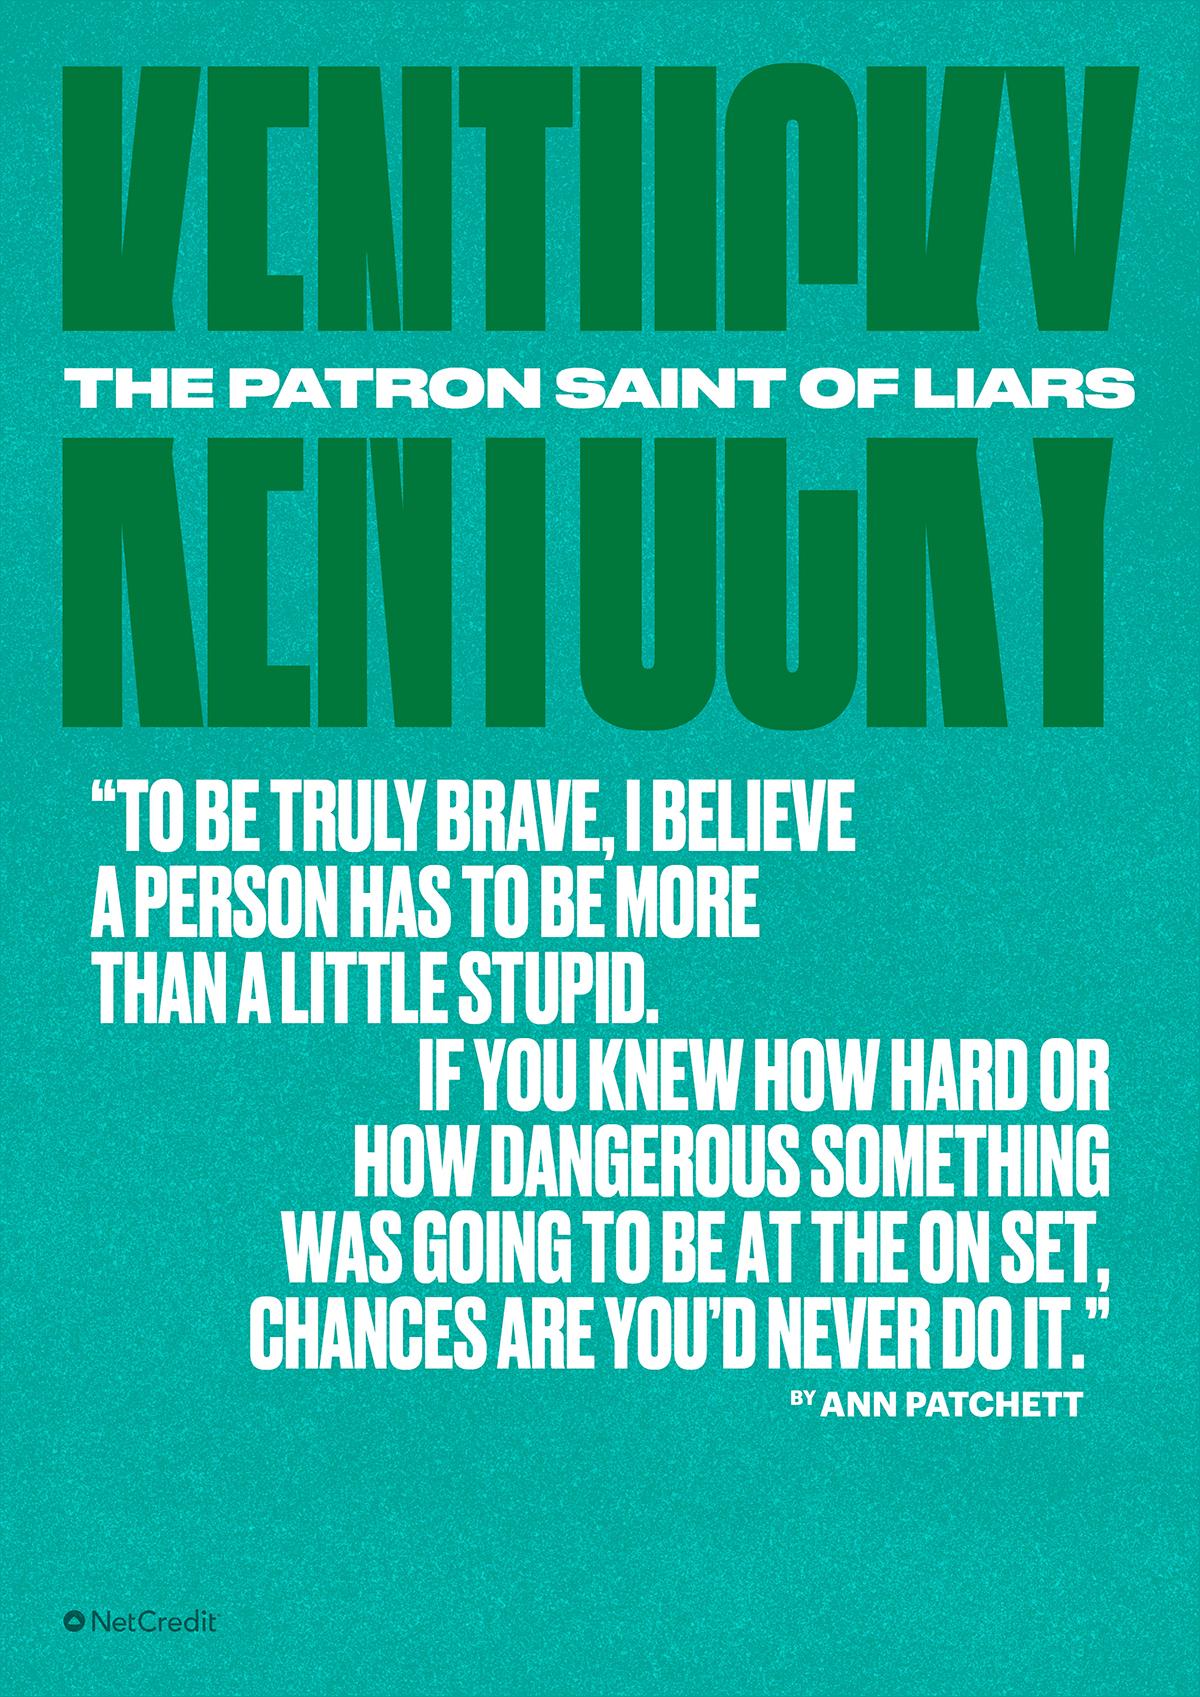 Patron Saint of Liars Kentucky